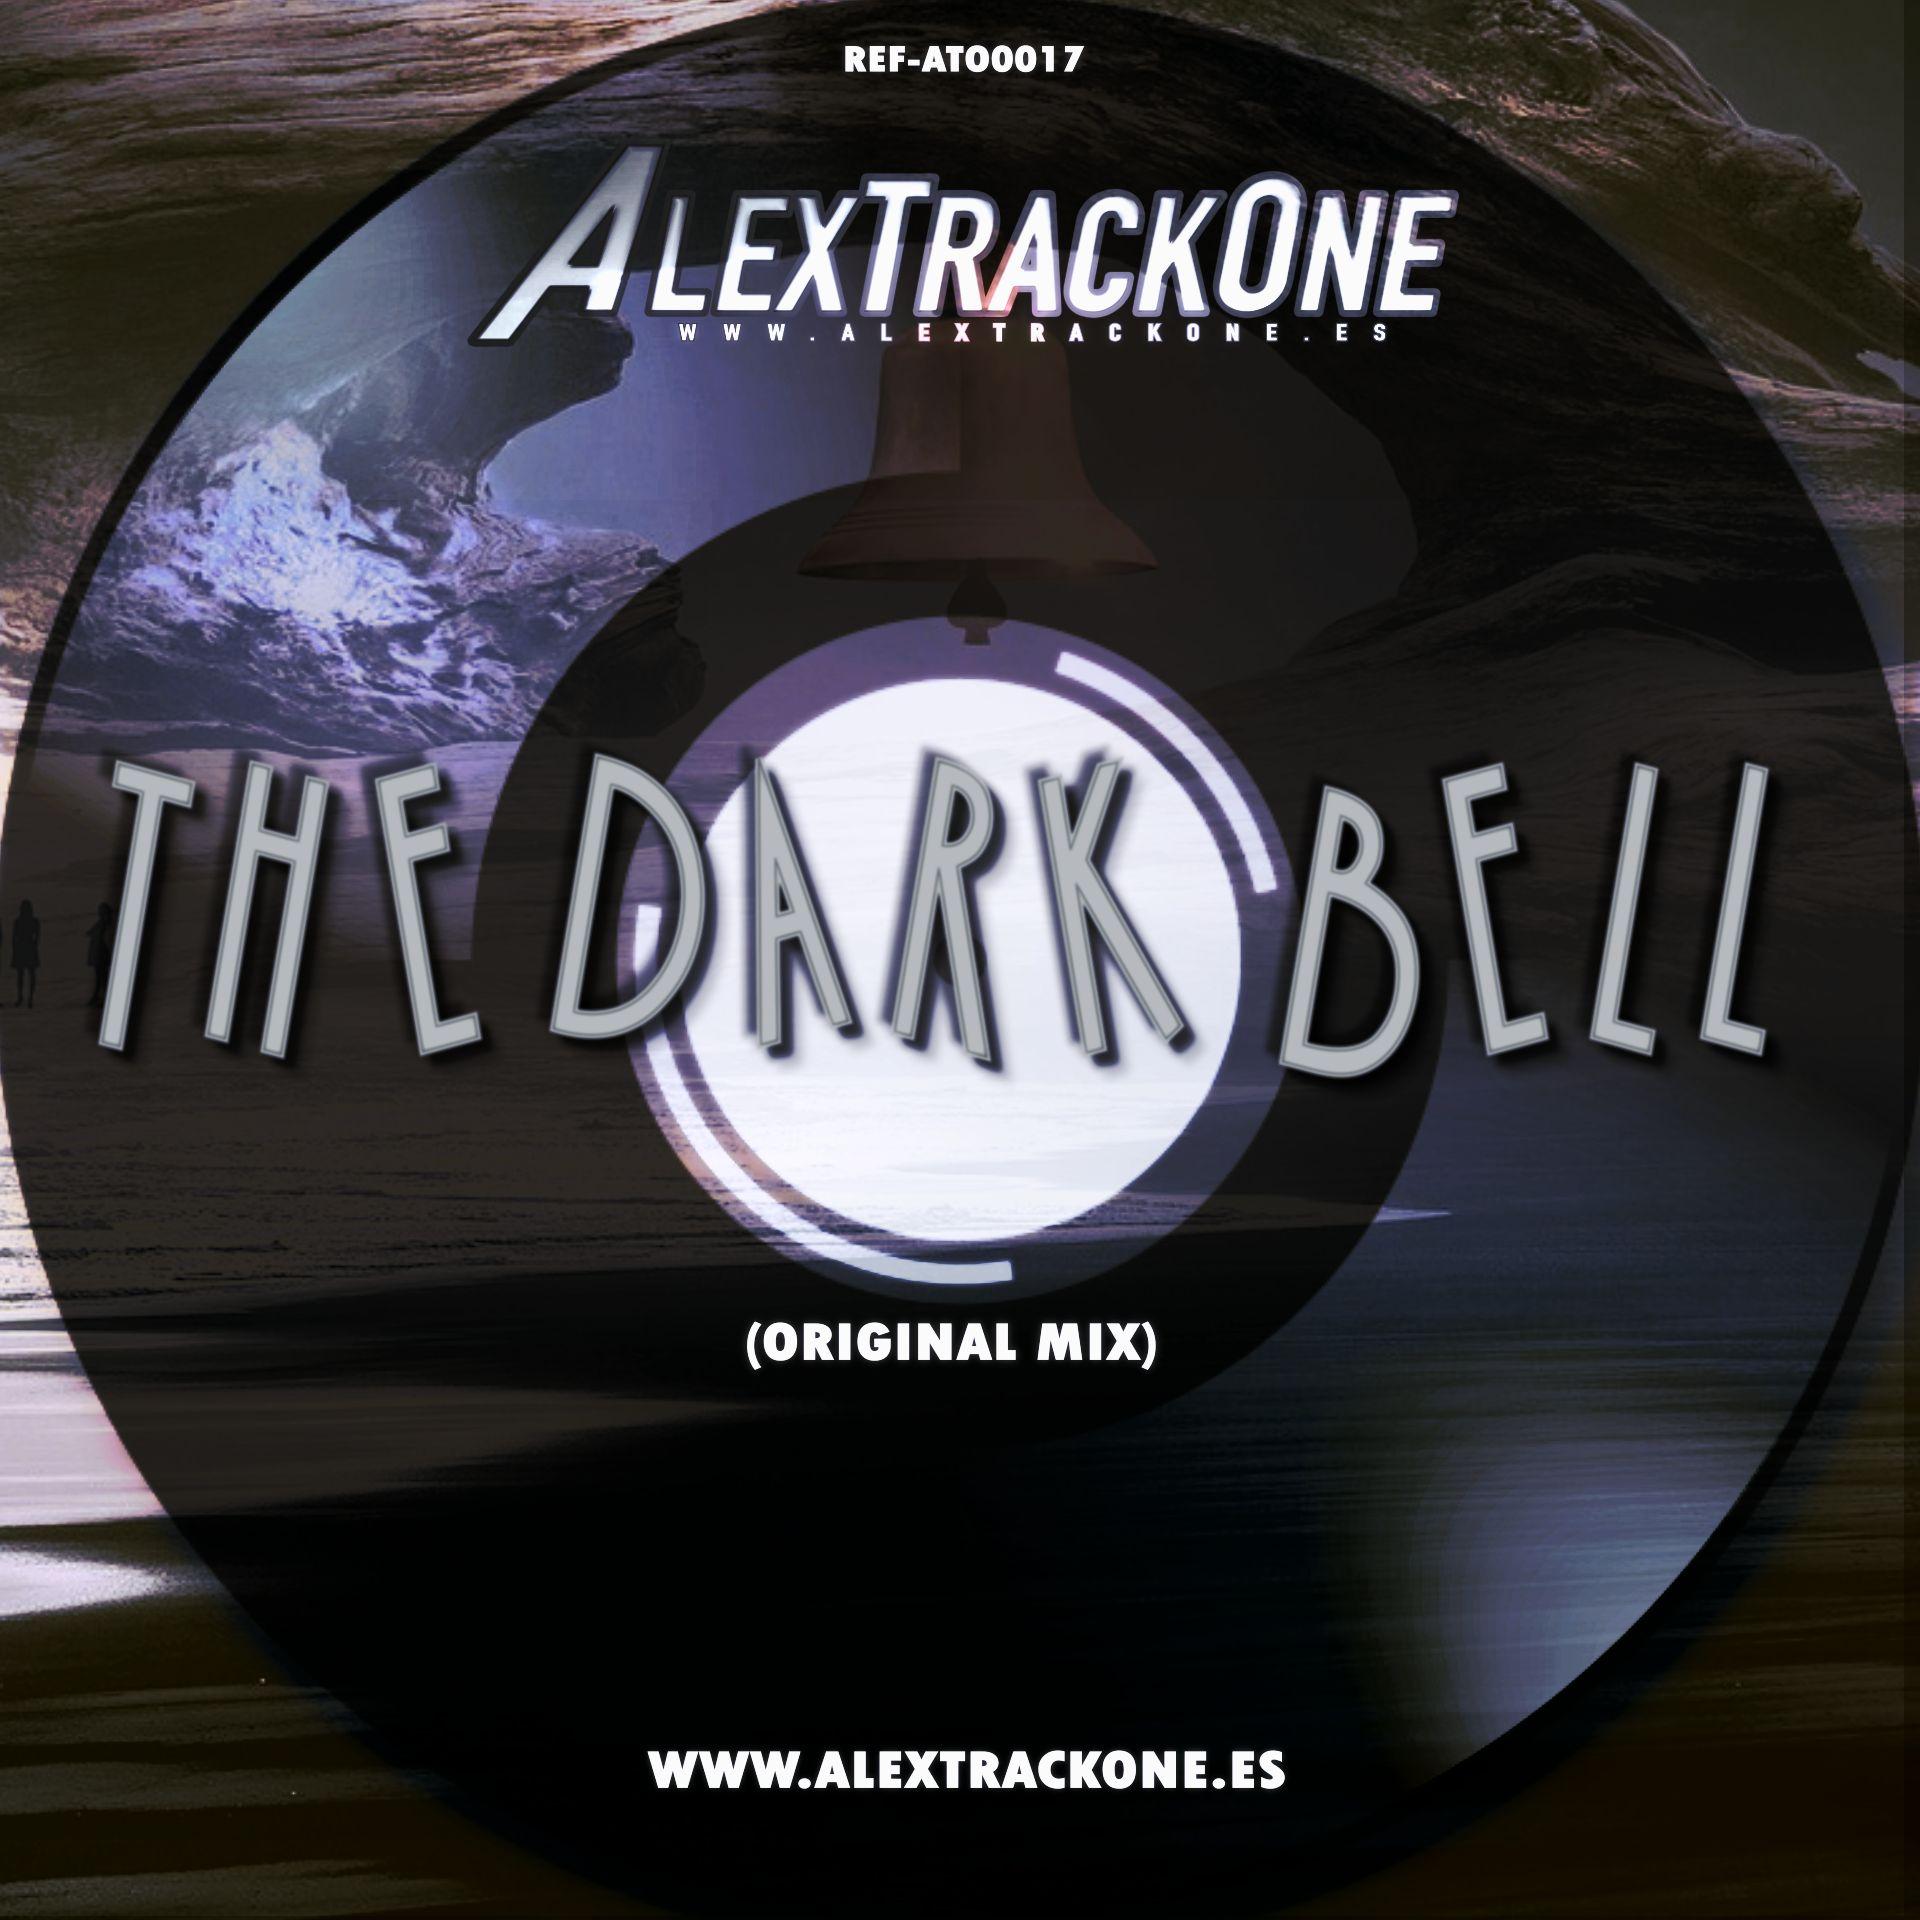 REF-ATO0017 THE DARK BELL (ORIGINAL MIX) (MP3 & WAV)